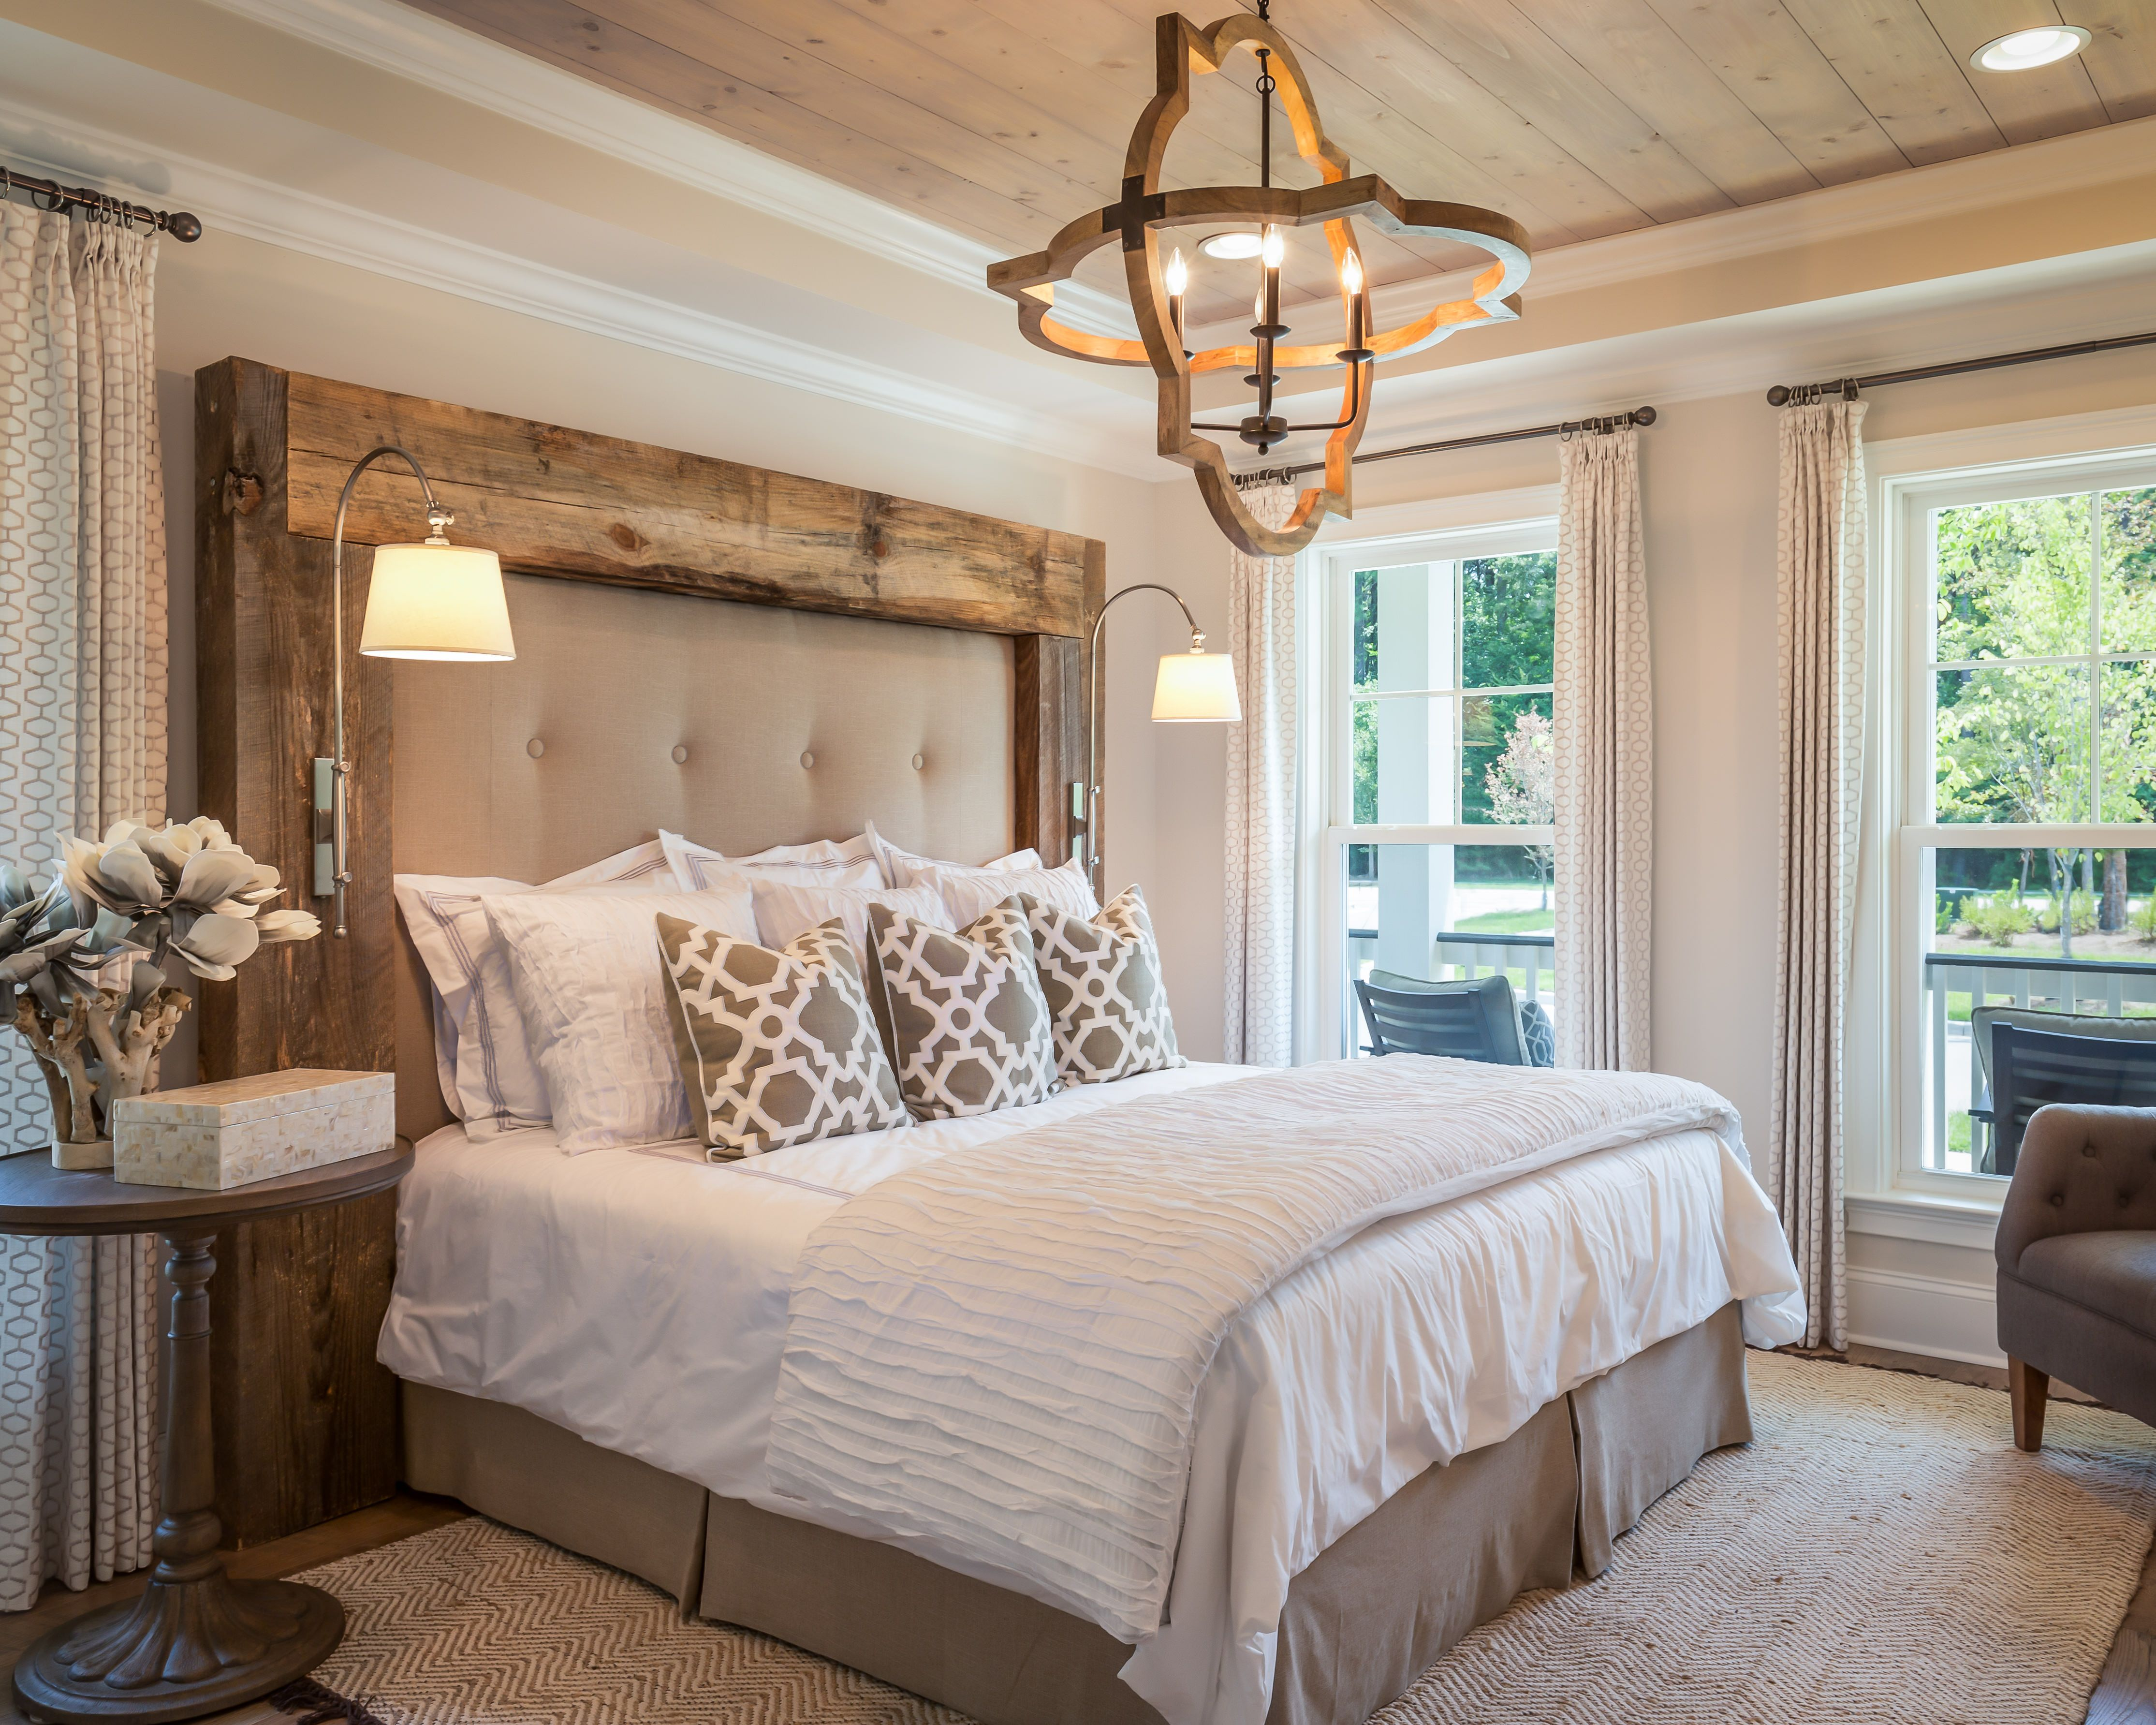 CalAtlantic Homes- Charleston, SC Model Home Merchandising